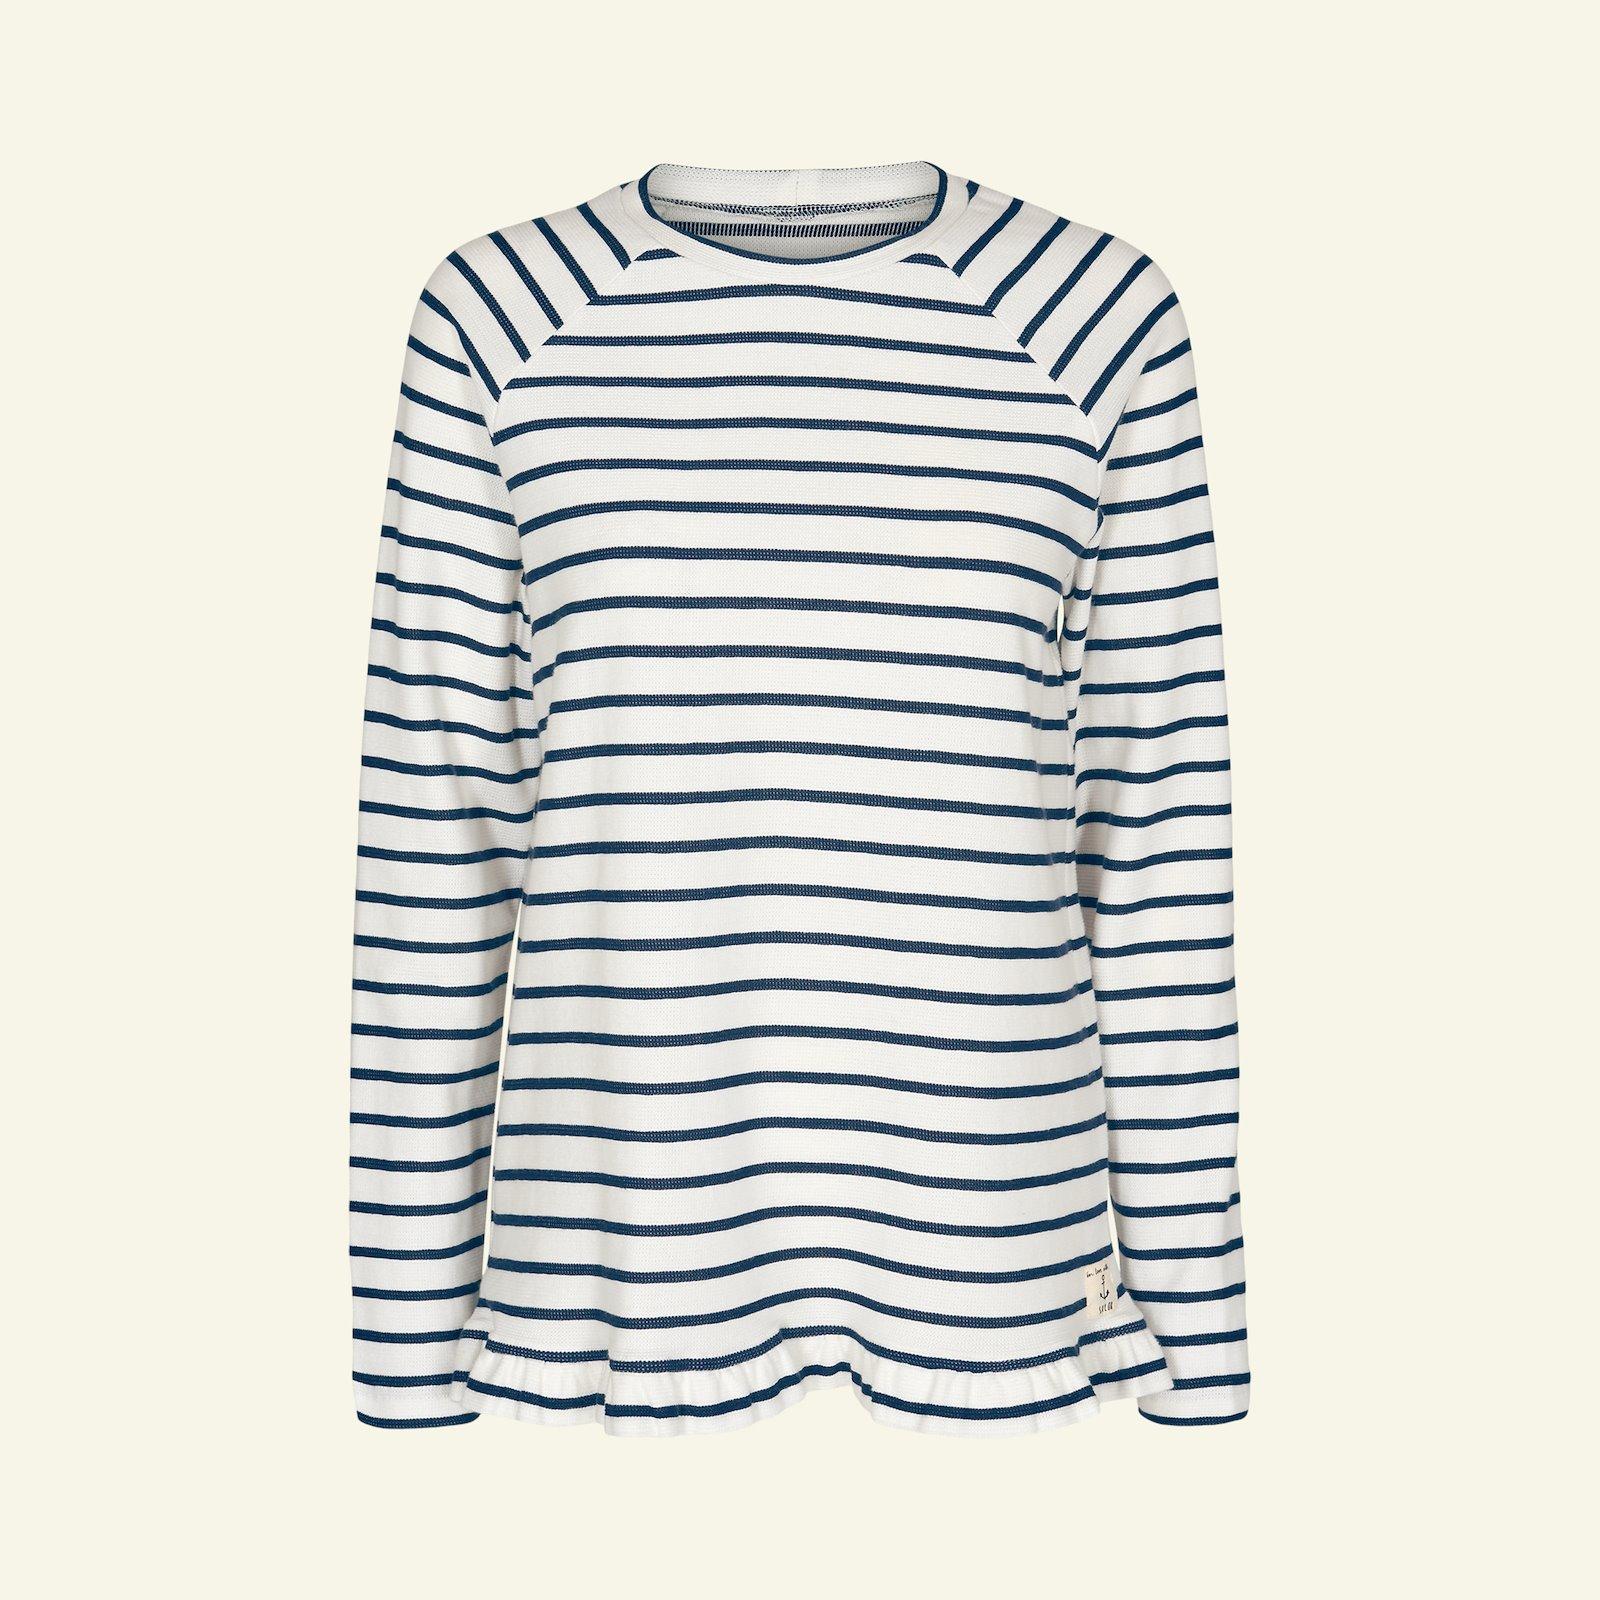 Raglan t-shirt, 36/8 p22072_203582_26547_sskit